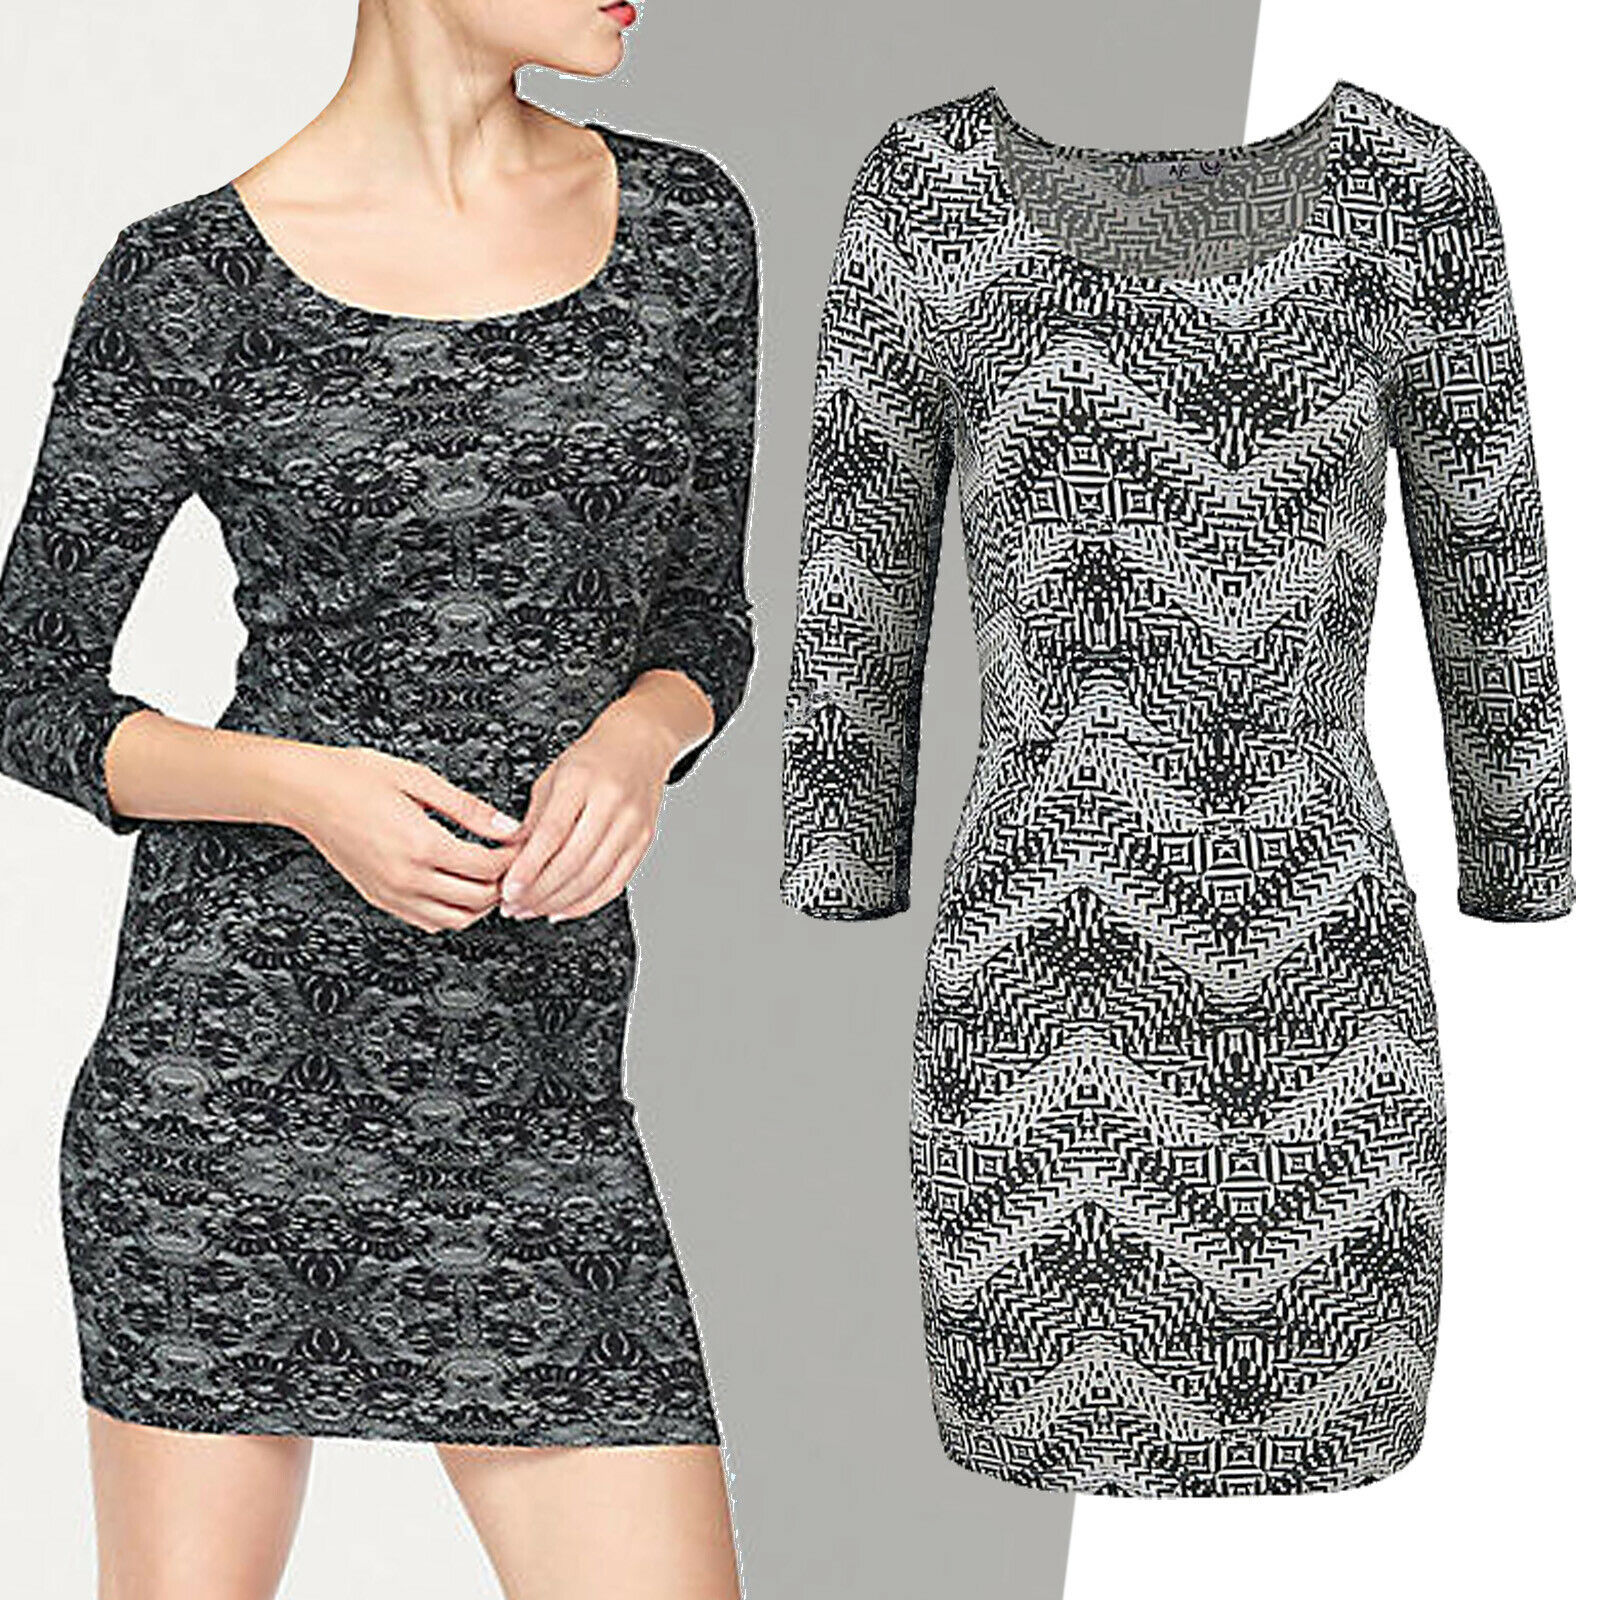 Great Mini Jersey Dress Dress Size 40 L Sexy Stretch Zig-Zag Pattern Black White